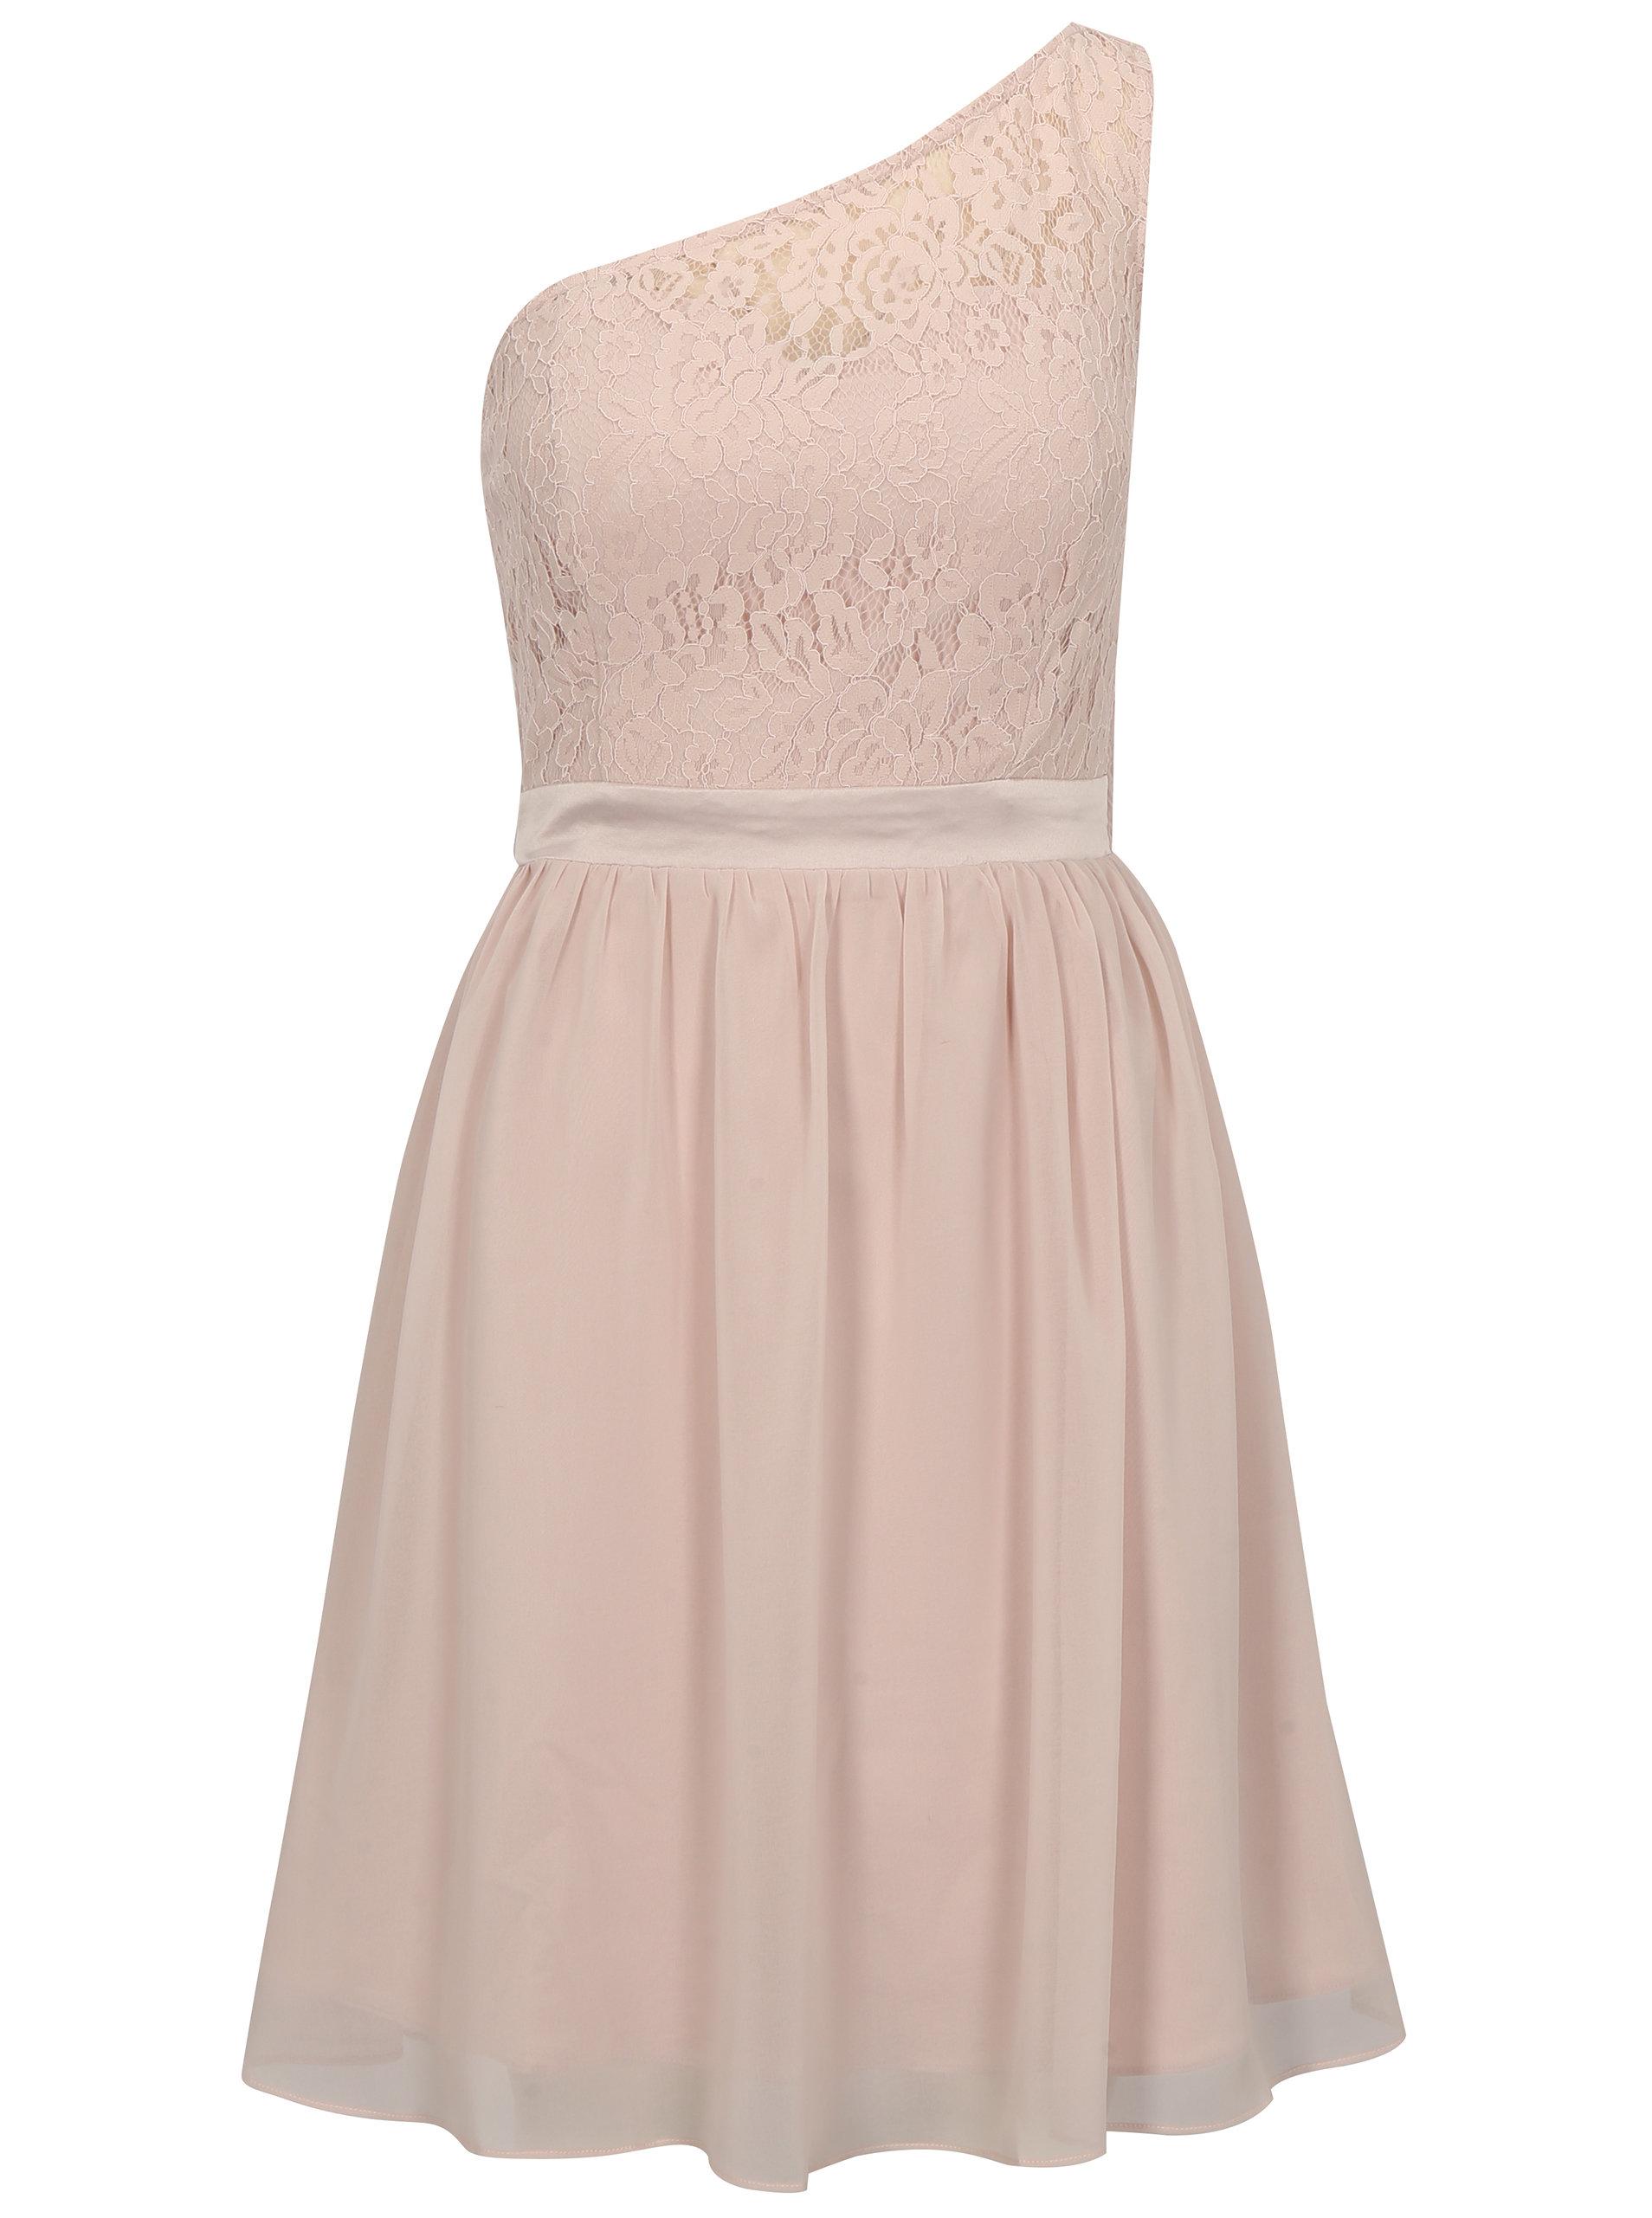 391422f0c388 Světle růžové šaty na jedno rameno Dorothy Perkins ...